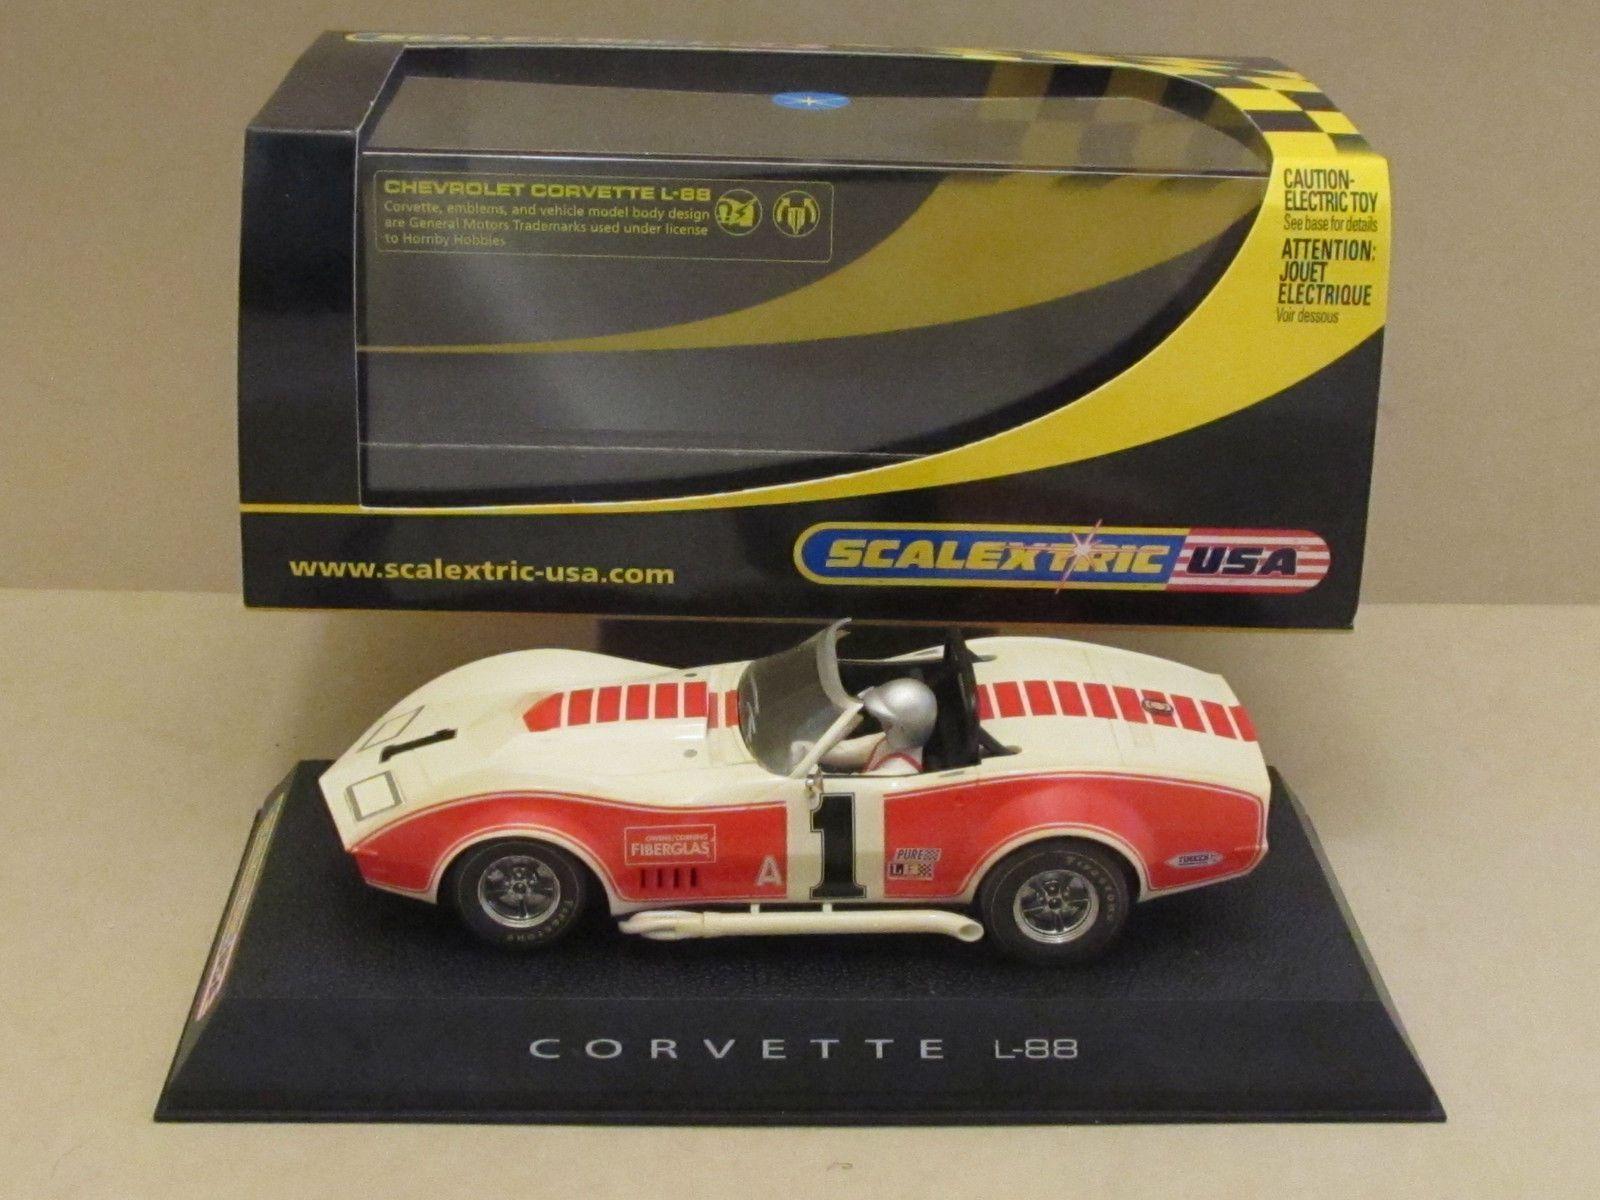 C2566 Scalextric 1969 Chevrolet l88 Corvette Convertible No1 Owens 1:32 Slot Car https://t.co/4RoWiT0I9i https://t.co/YuZ7O4SOJY